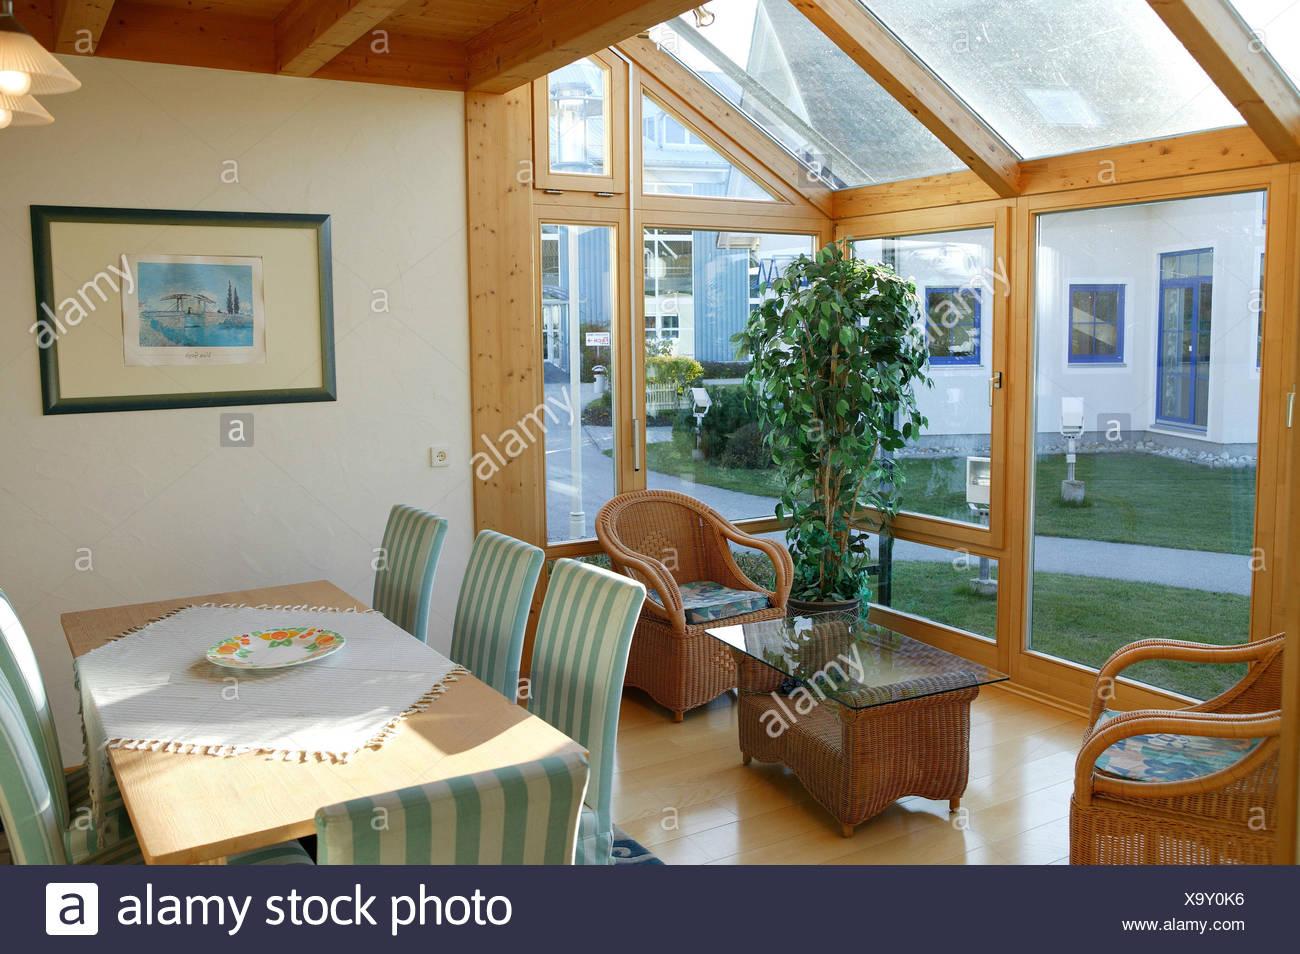 Maison Individuelle Veranda Living Square Table A Manger Chambre